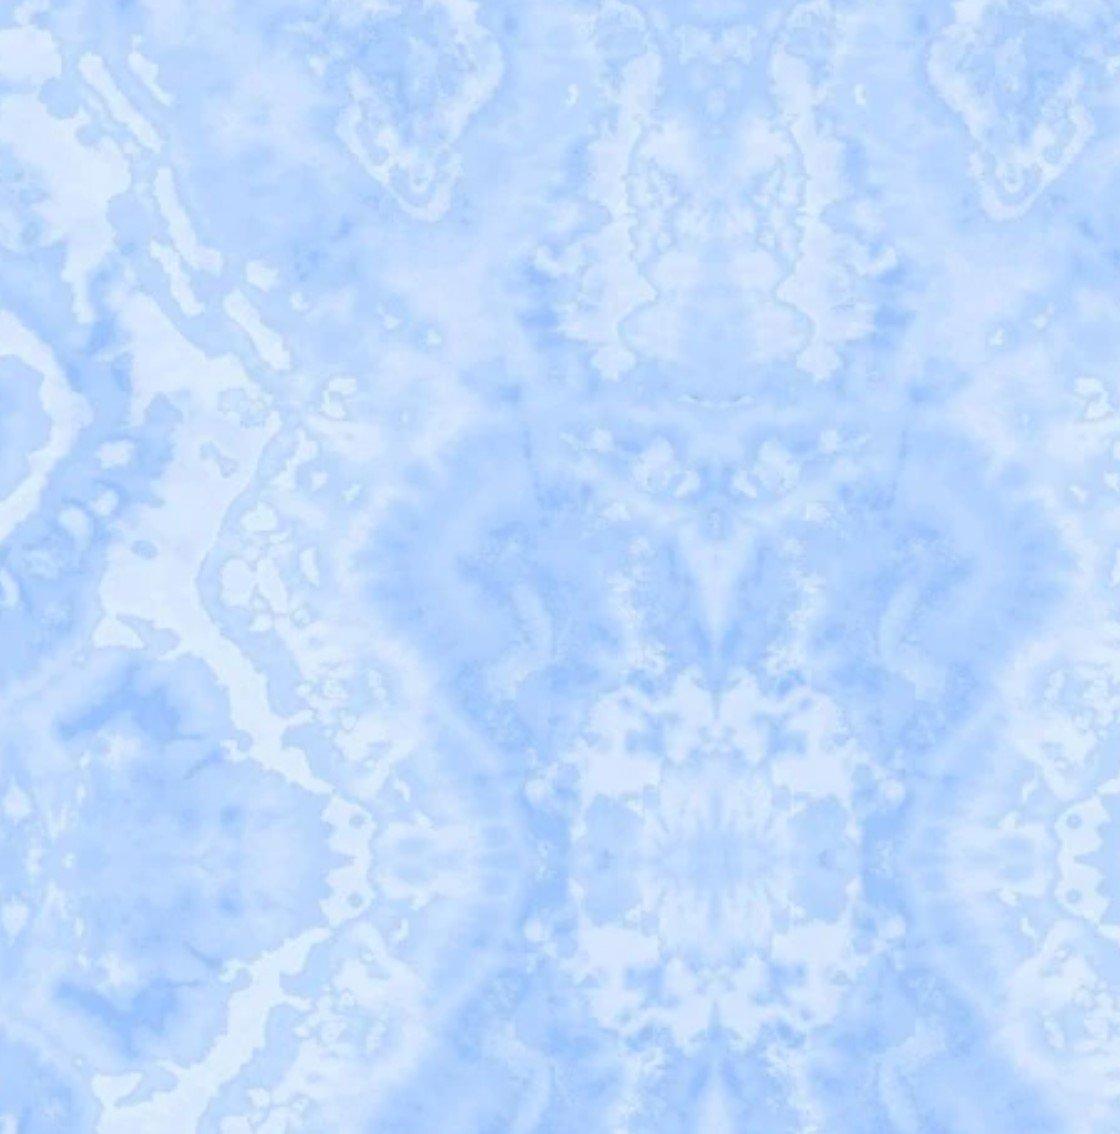 Comfy Prints Blue Flannel